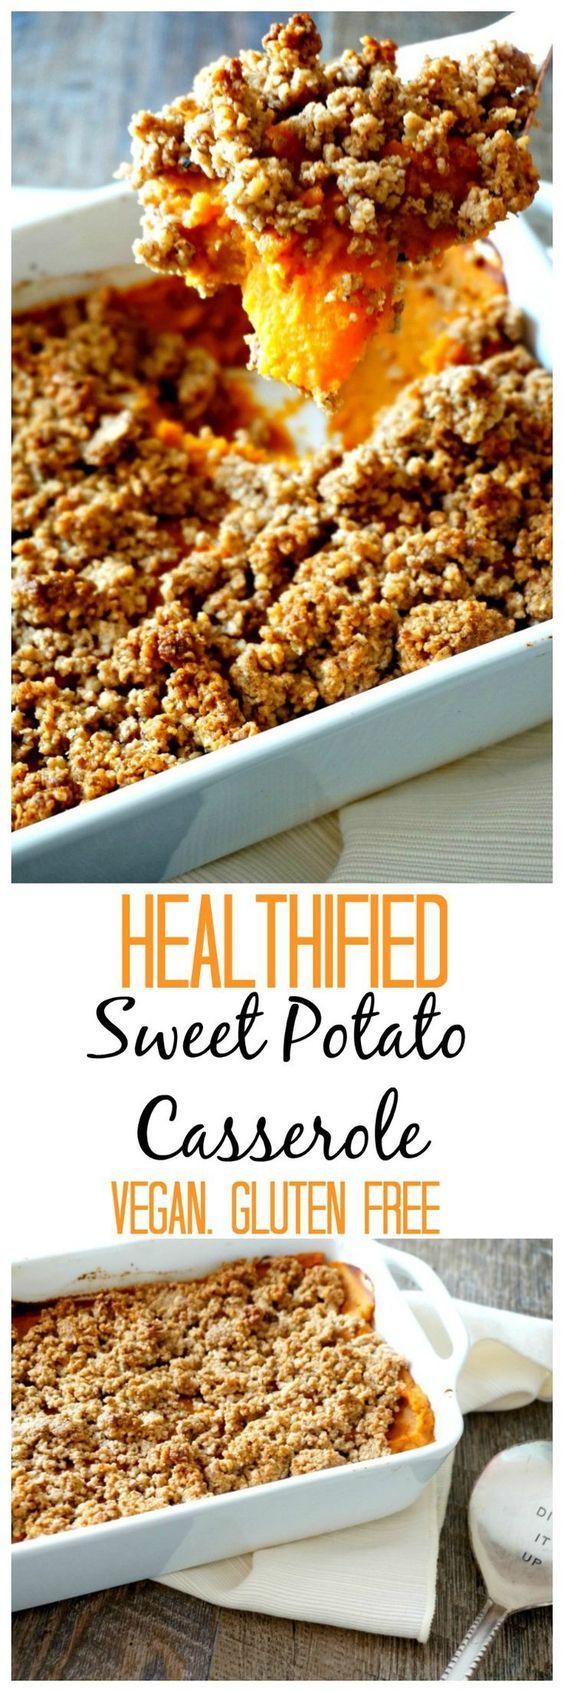 Healthified Sweet Potato Casserole: A lightened up, naturally sweetened version of sweet potato casserole.. Vegan. Gluten Free.